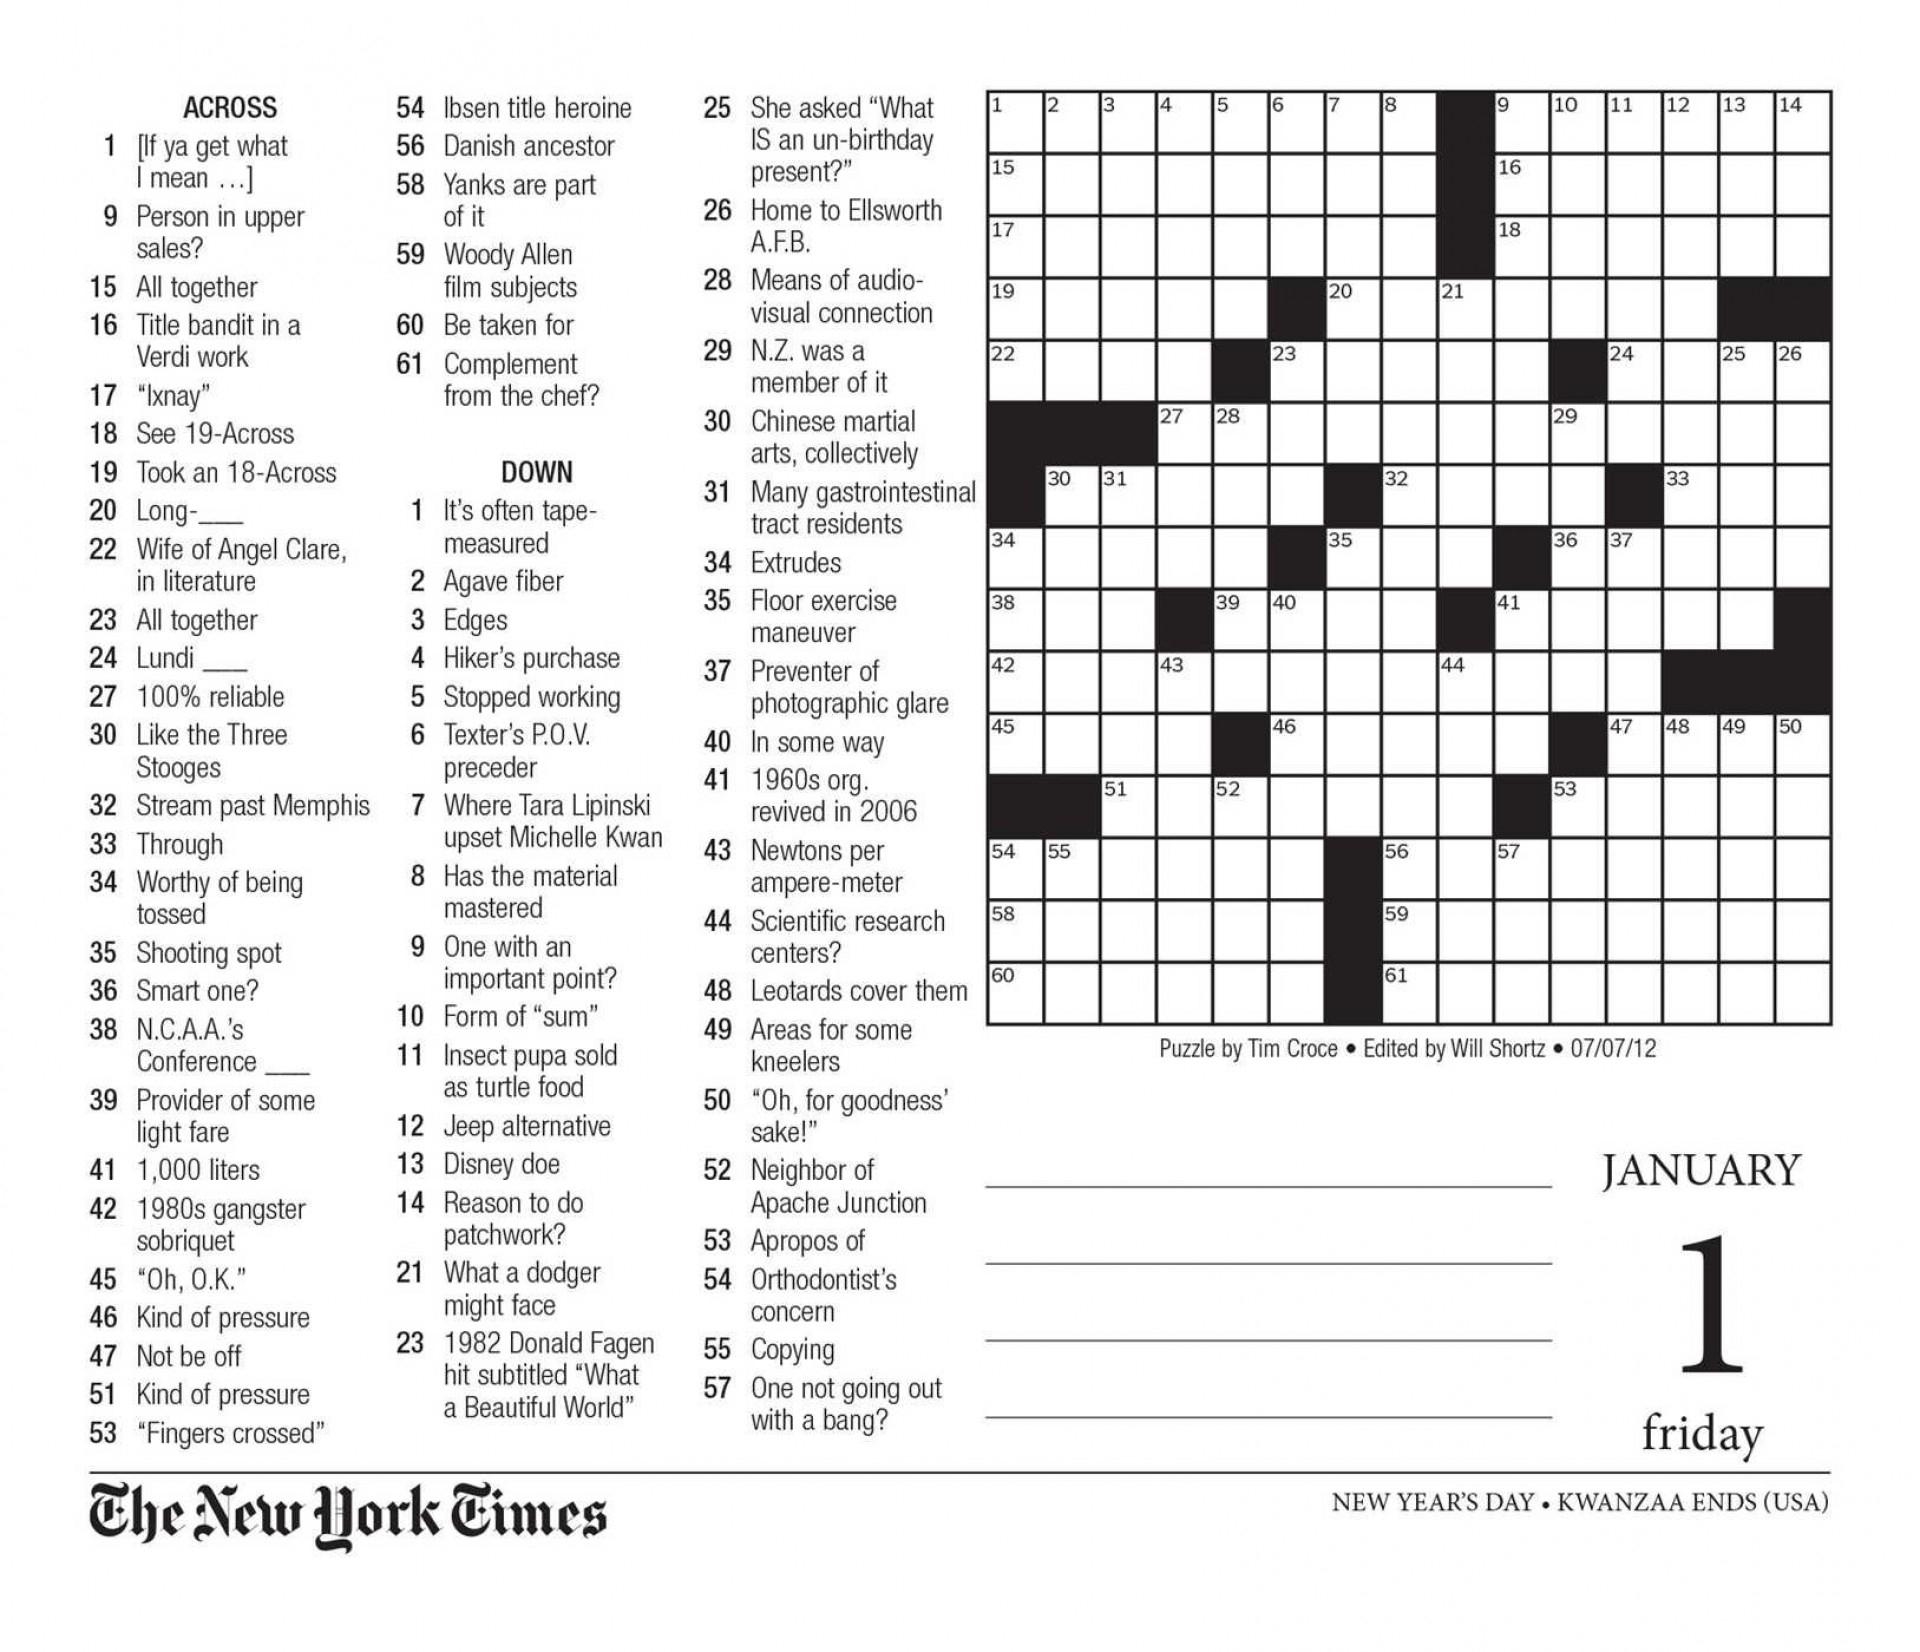 Free Printable Large Print Crossword Puzzles | M3U8 - Large Print Crossword Puzzles Online